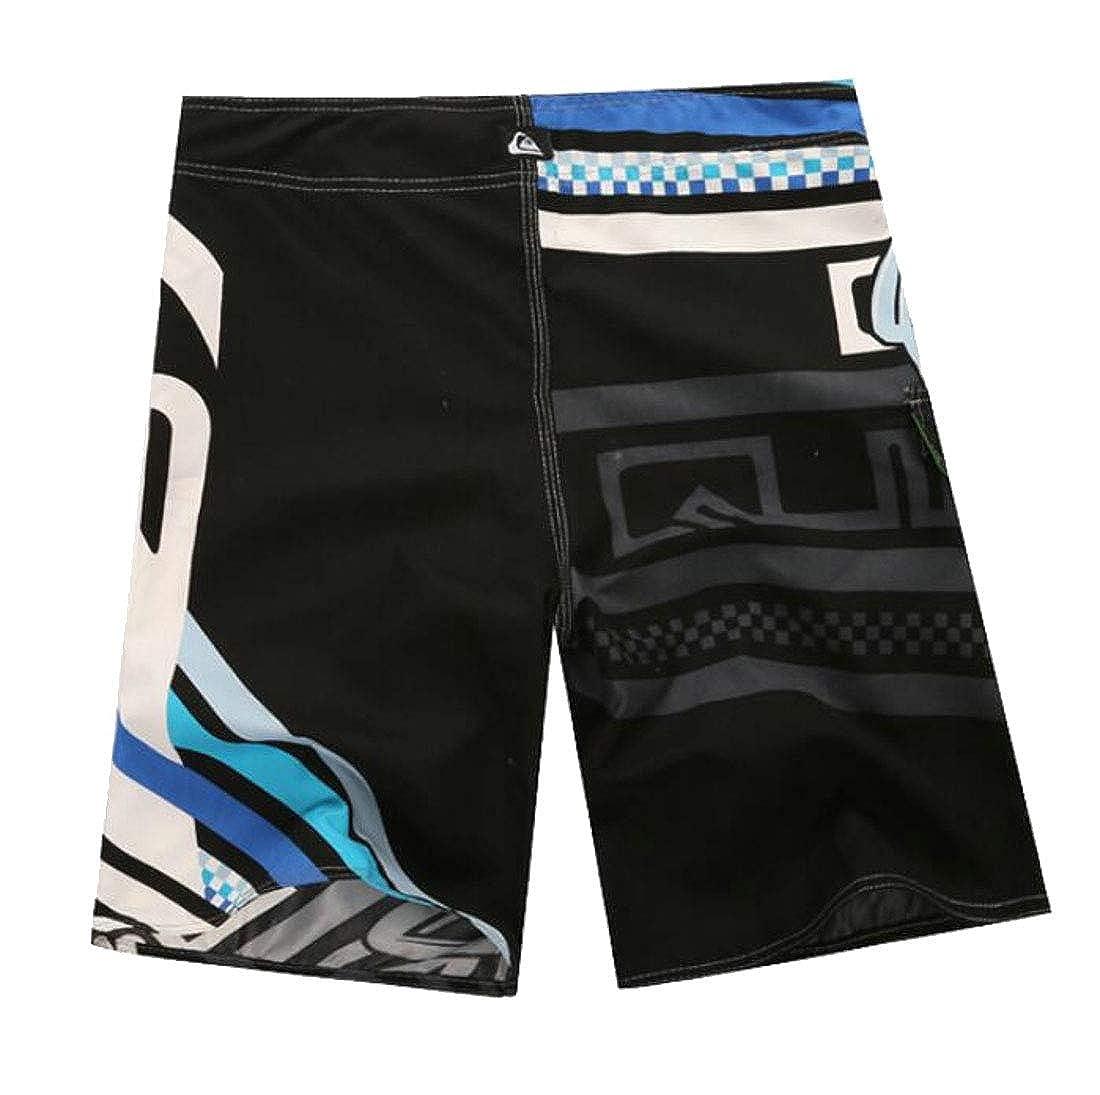 Tiger Paw Logo Mens Swim Trunks Quick Dry Holiday Beach Short Casual Board Shorts